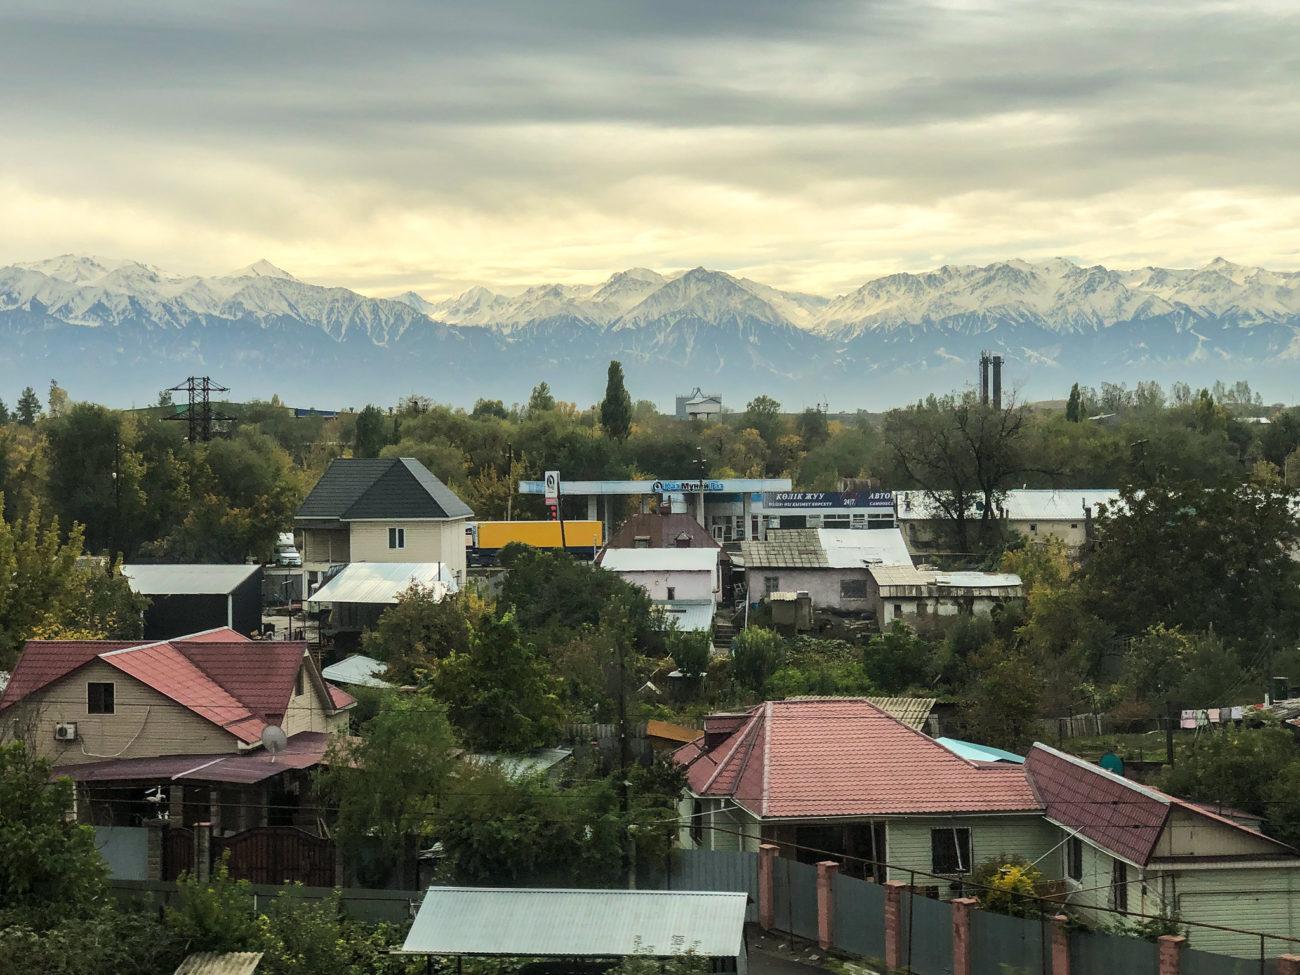 A town outside Almaty (illustration)